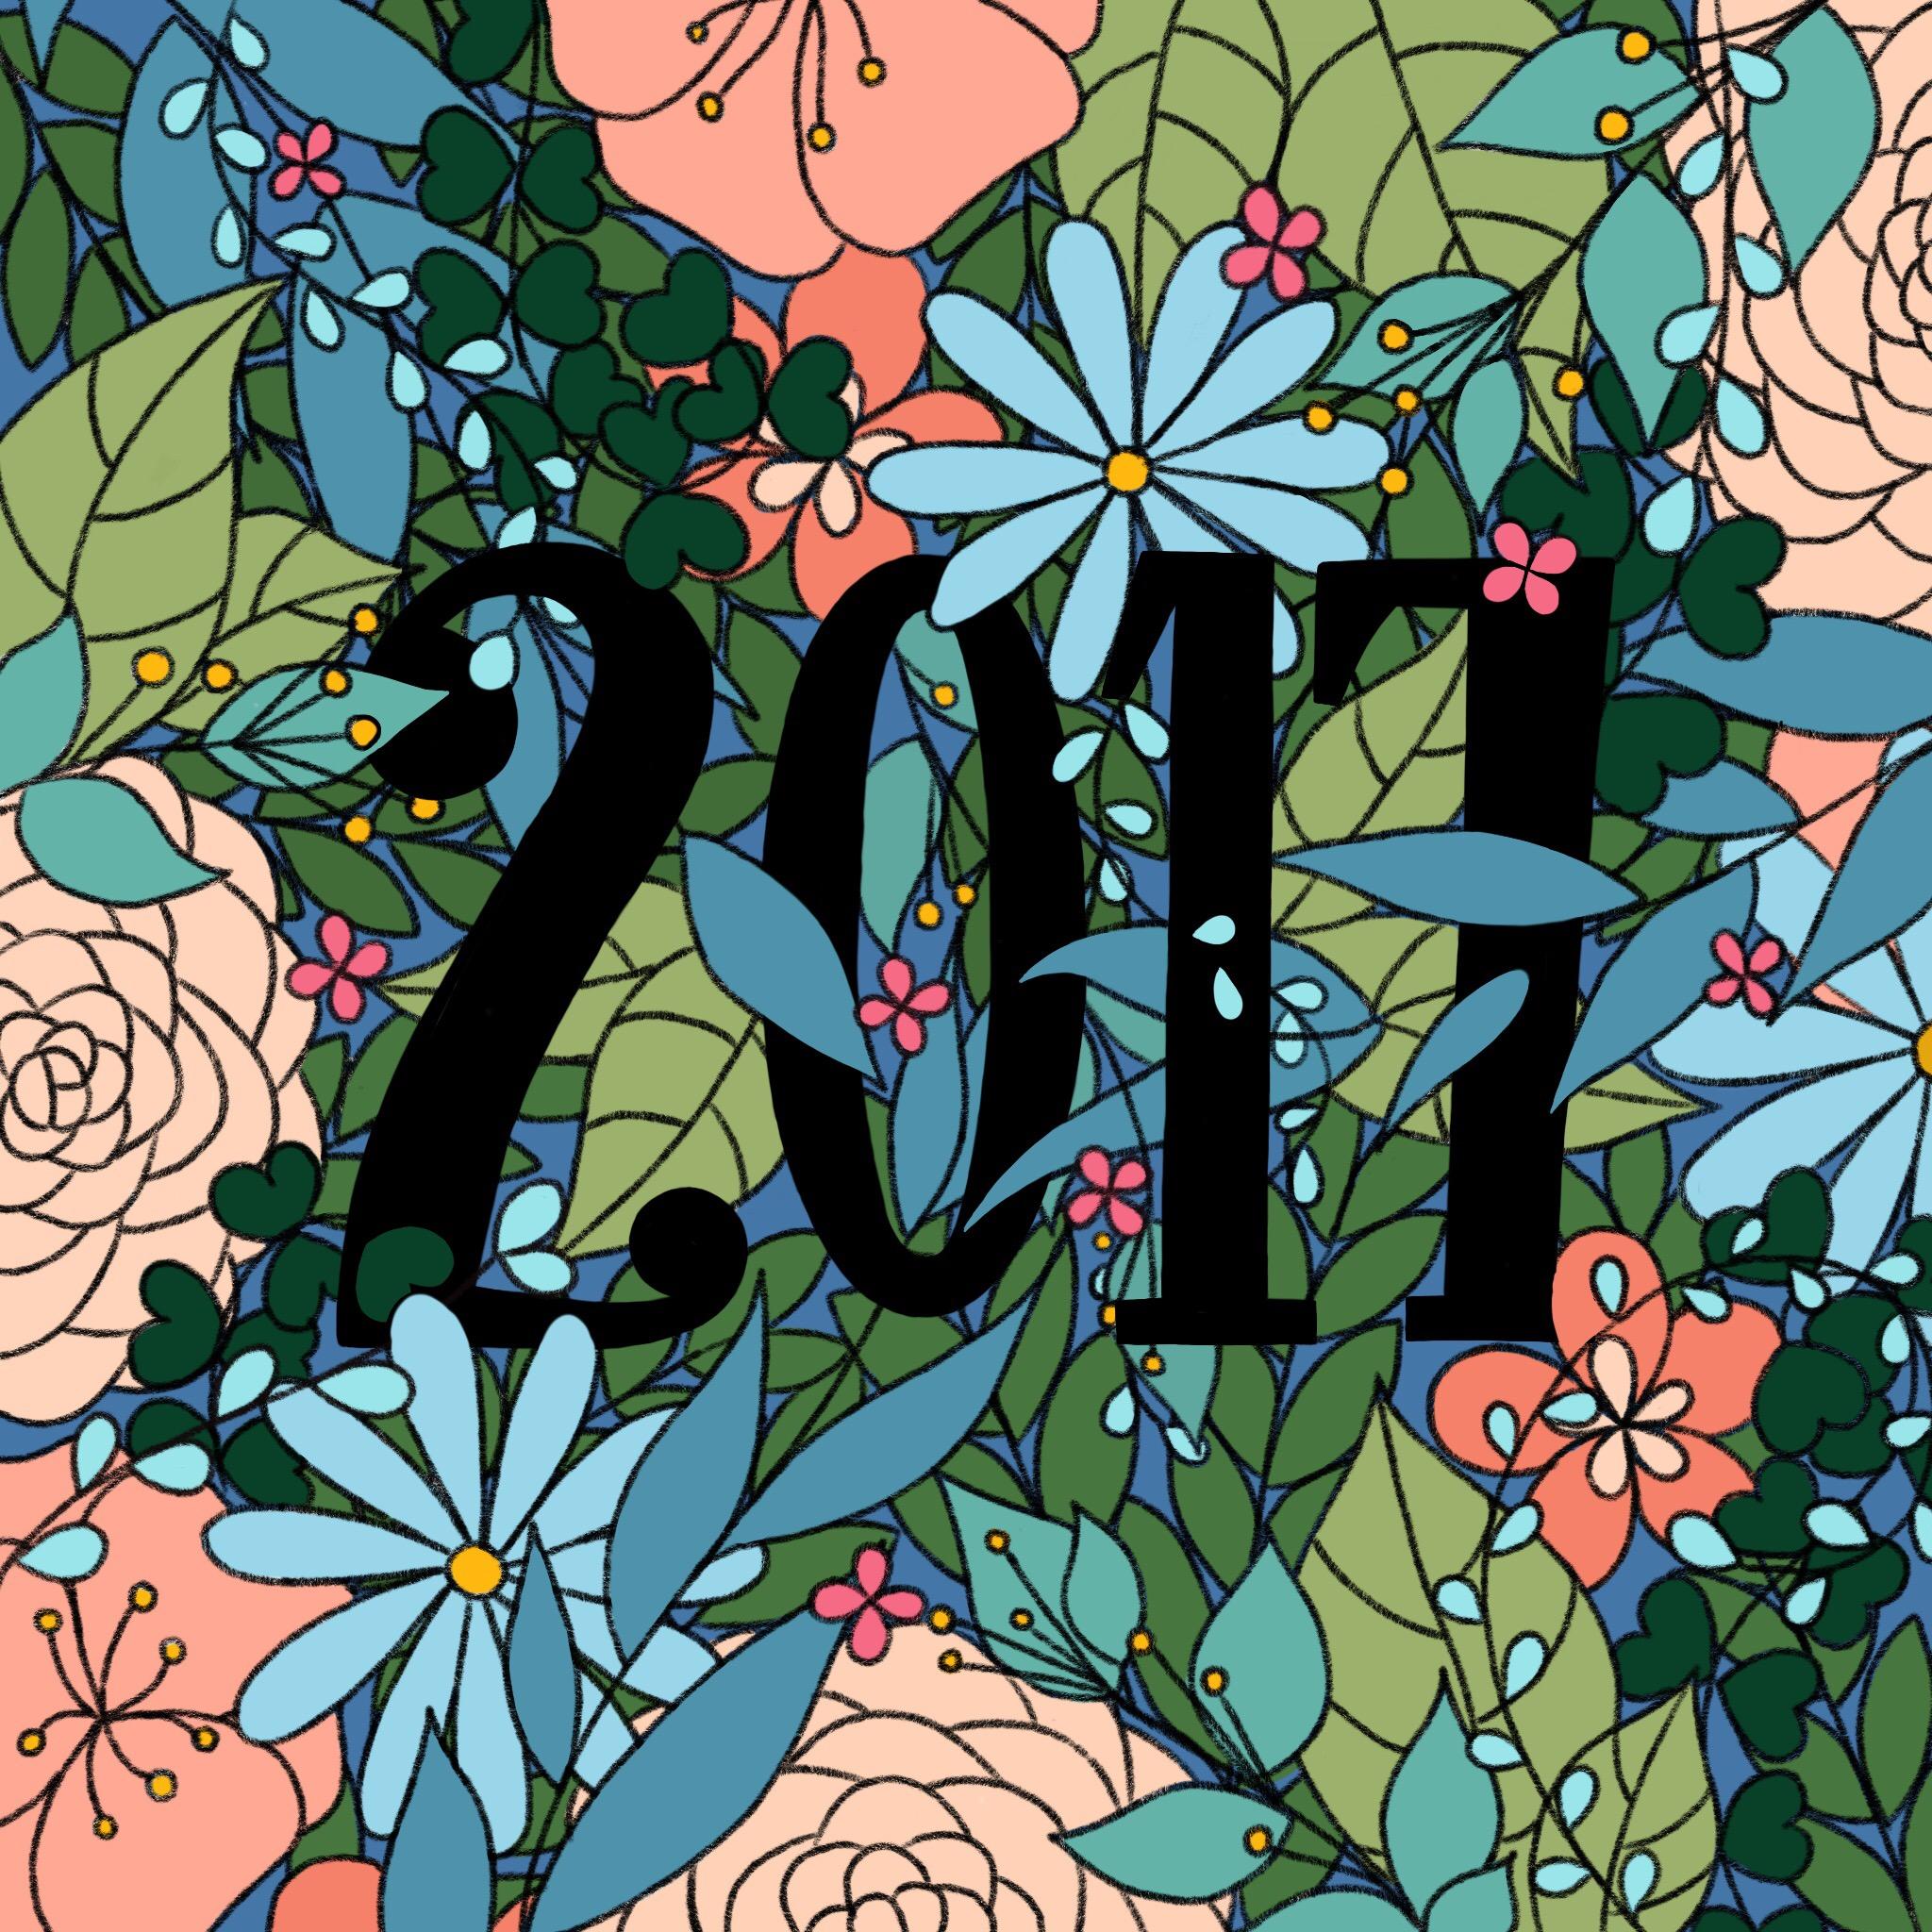 Pingle Pie 2017 Floral Collage, iPad & Apple Pencil